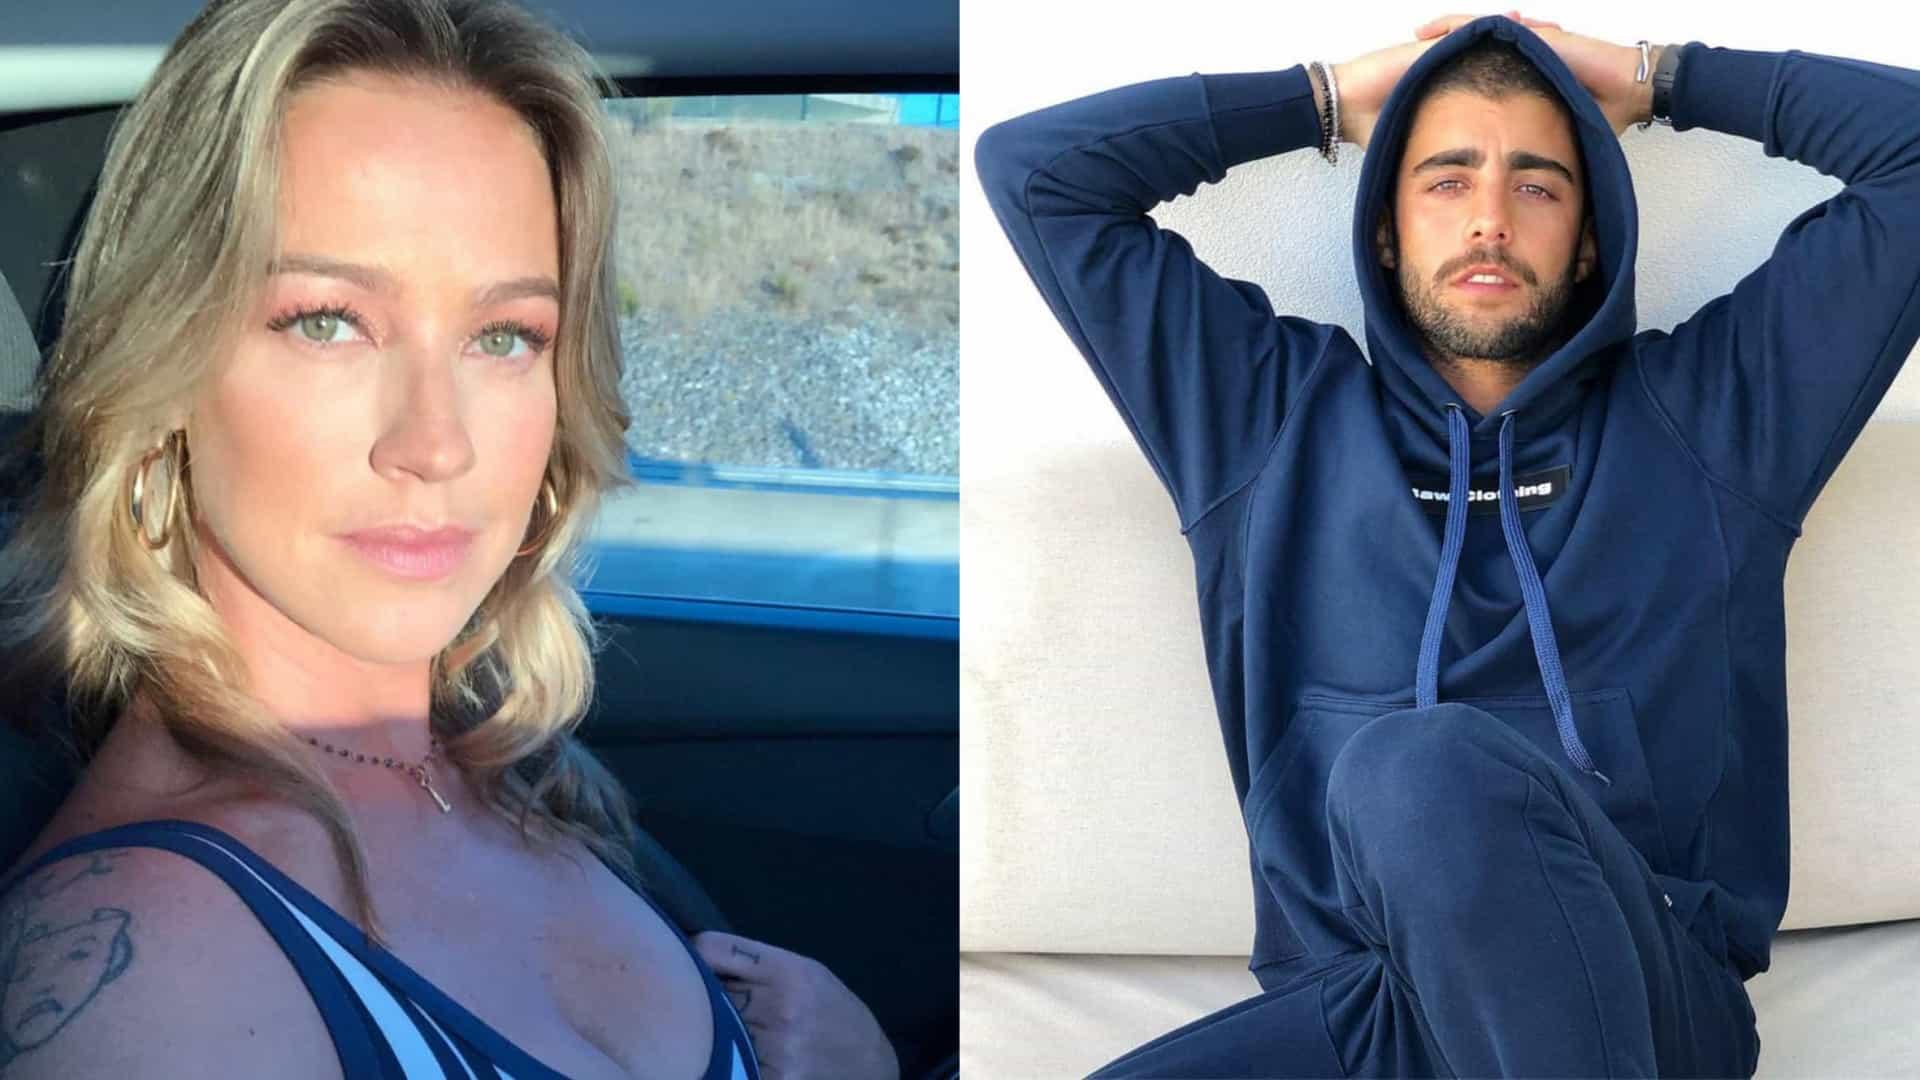 Luana Piovani terá atirado roupa do 'ex' para a rua após saber de namoro